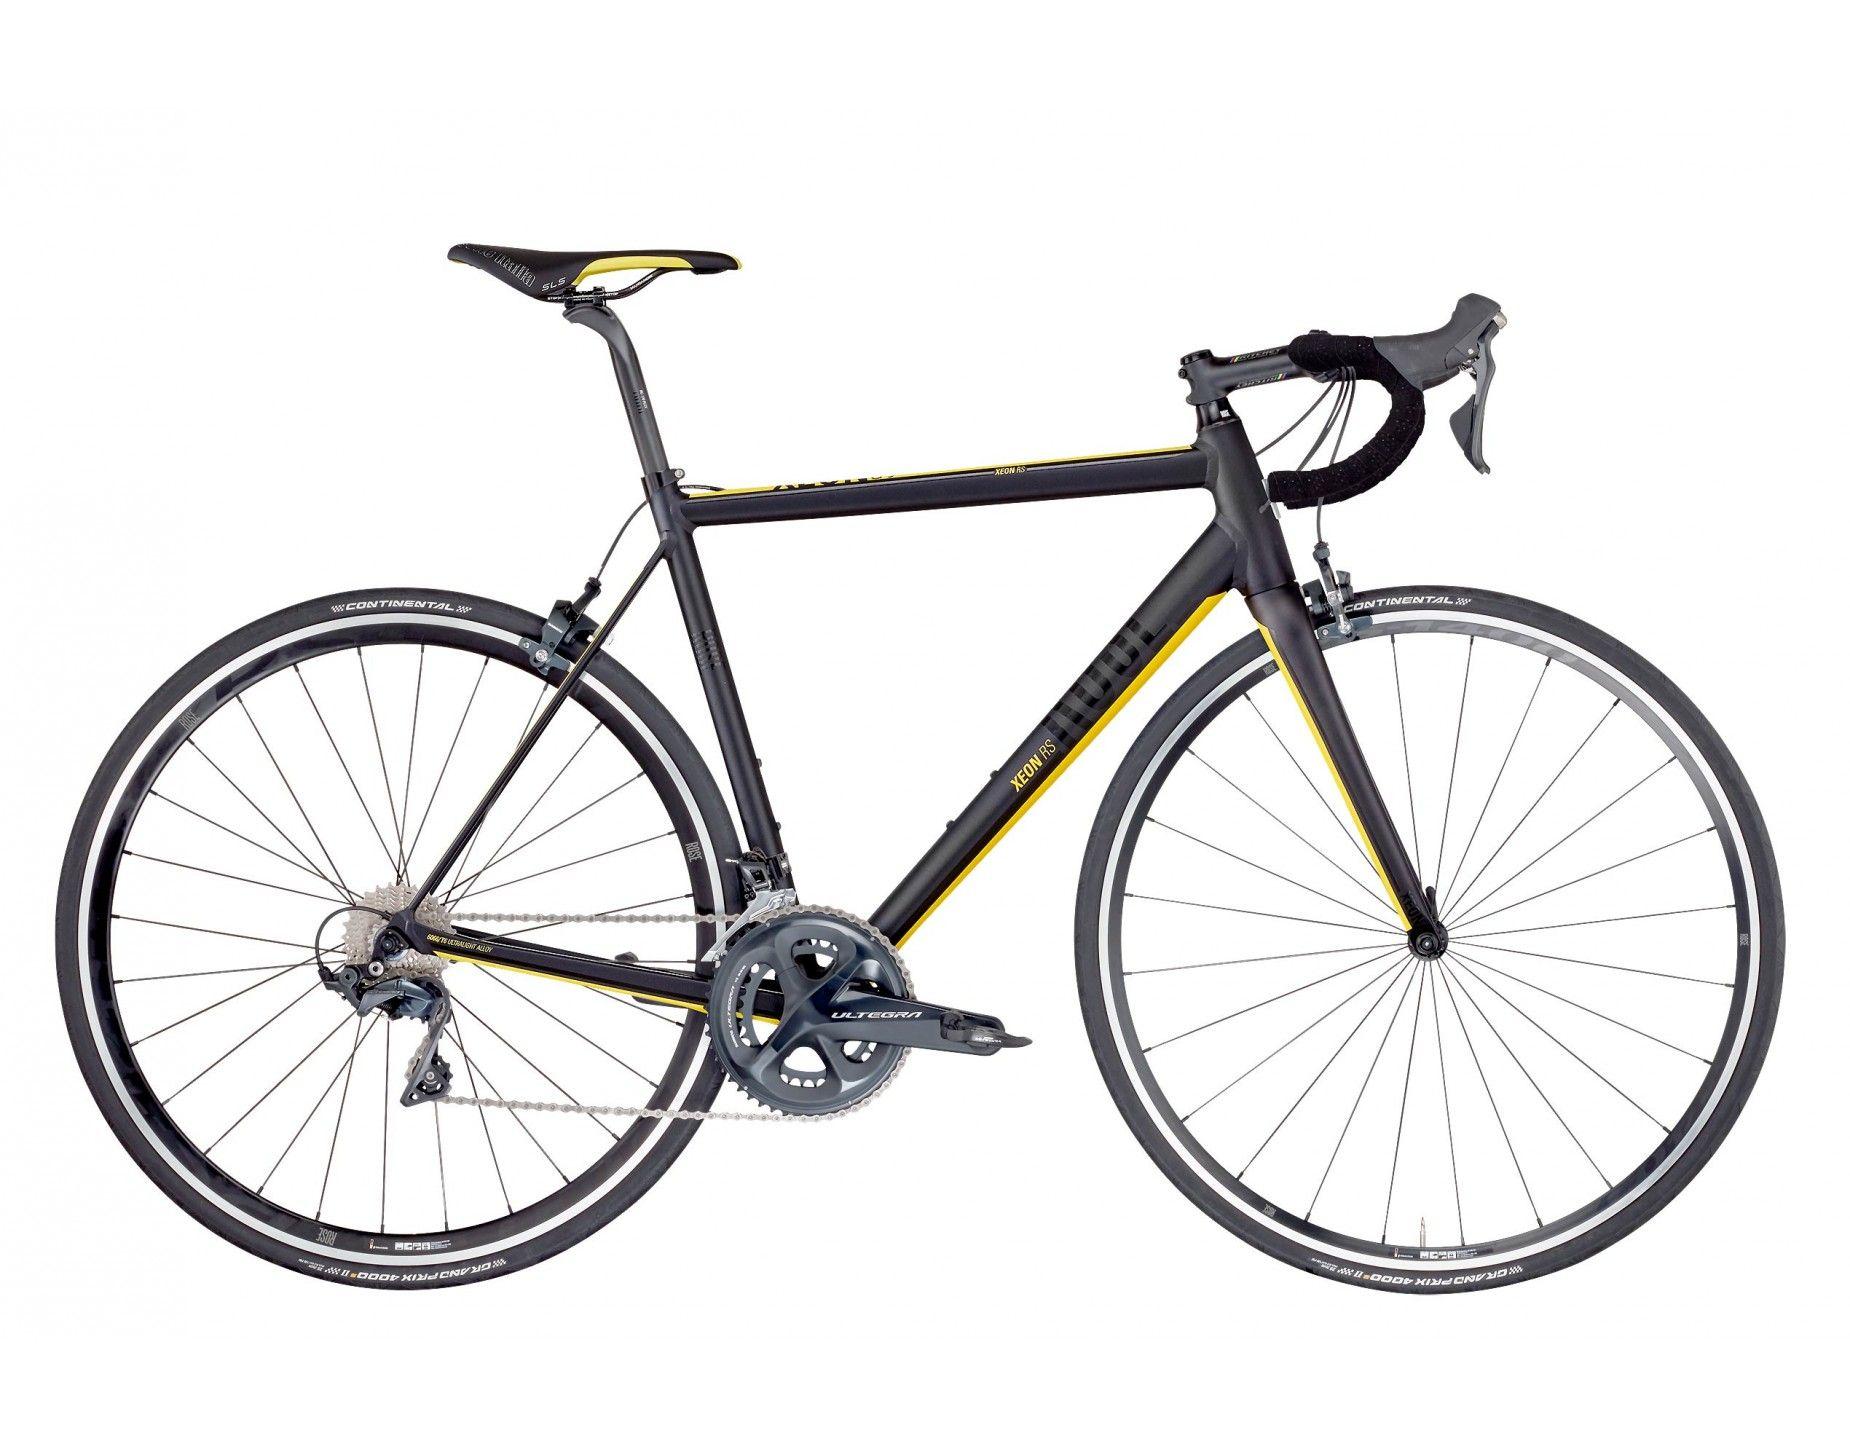 ROSE XEON RS Ultegra anodized black/yellow